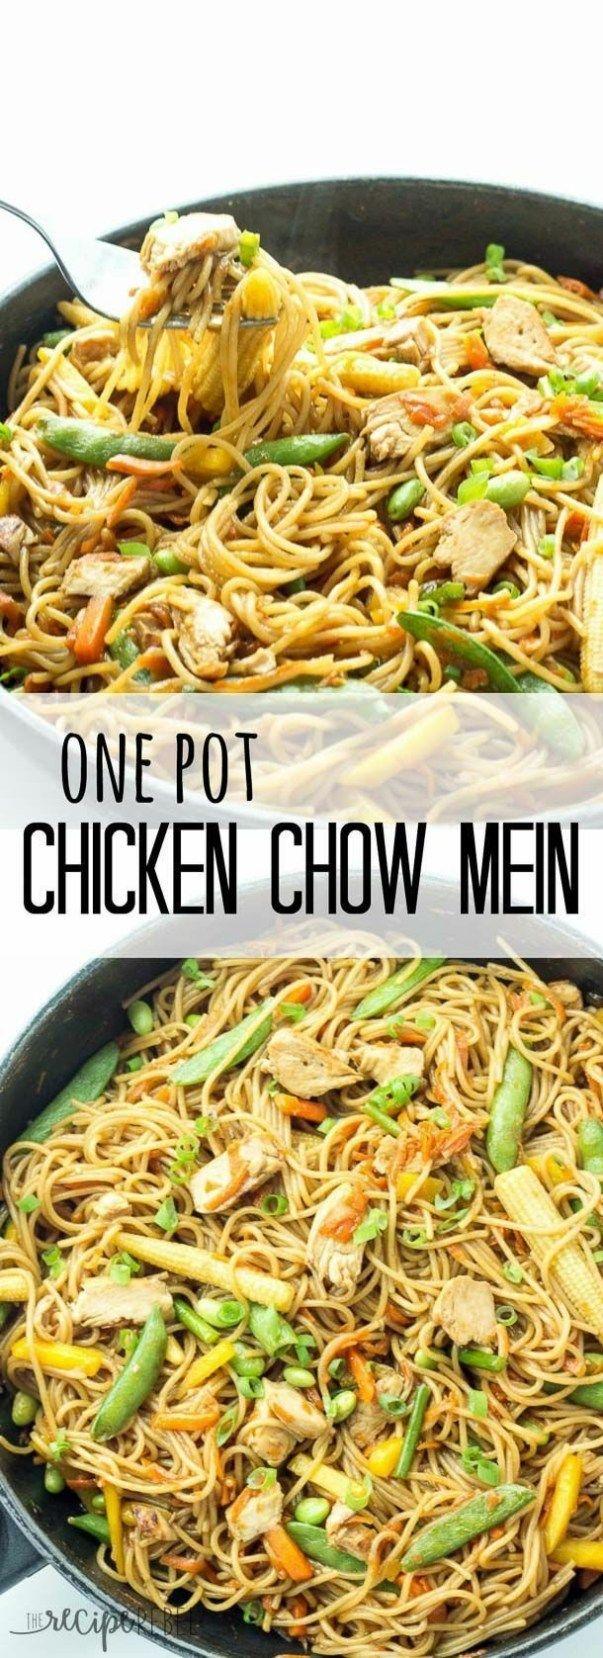 31 Chicken Instant Pot Recipes: Easy and Healthy | Decor Dolphin #instantpotrecipeseasy